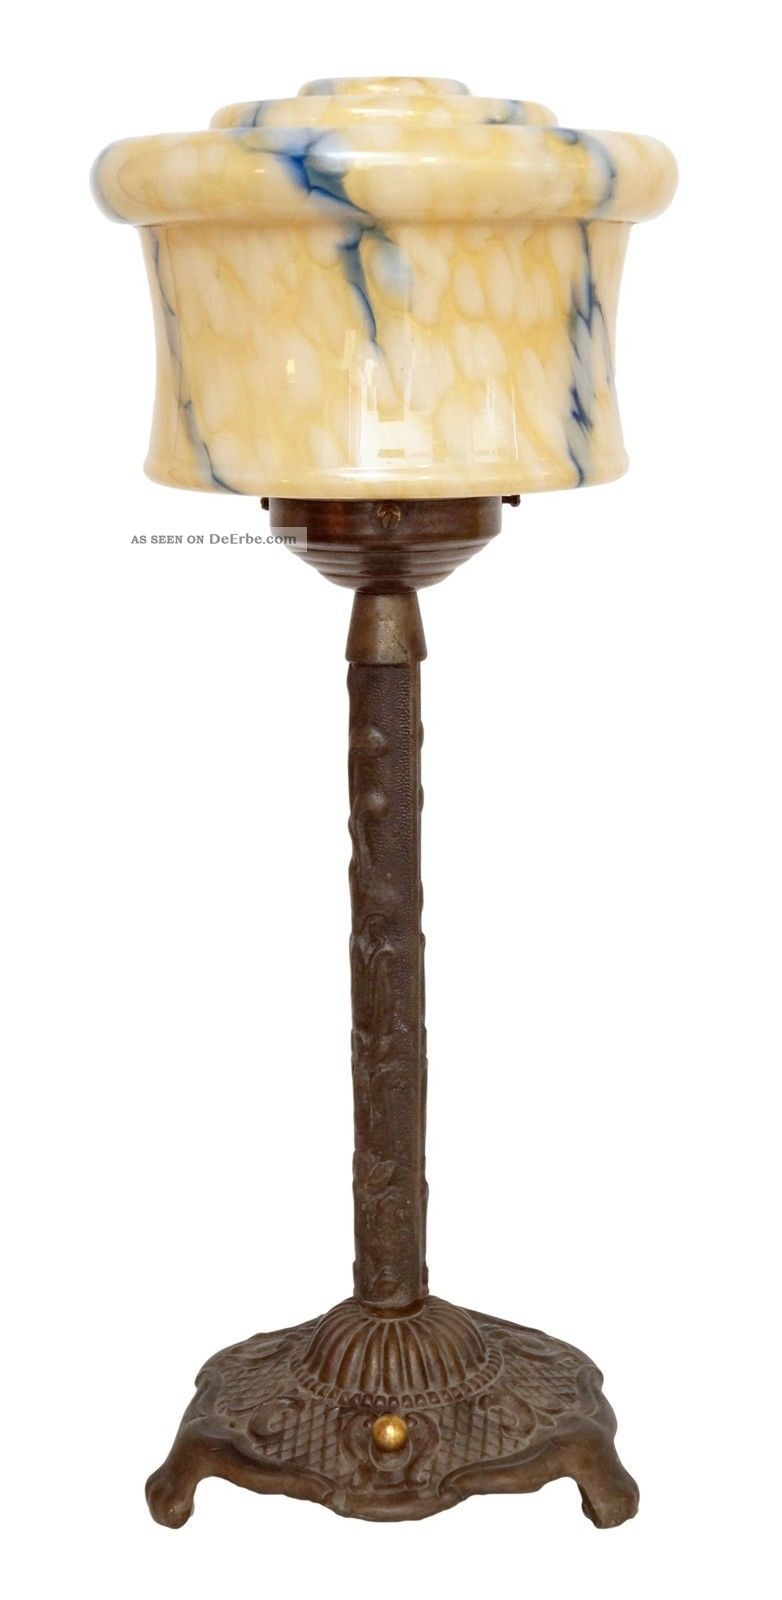 Fantastische Jugendstil Art Déco Tischlampe Lampe Messing 1930 Opalglas 1920-1949, Art Déco Bild